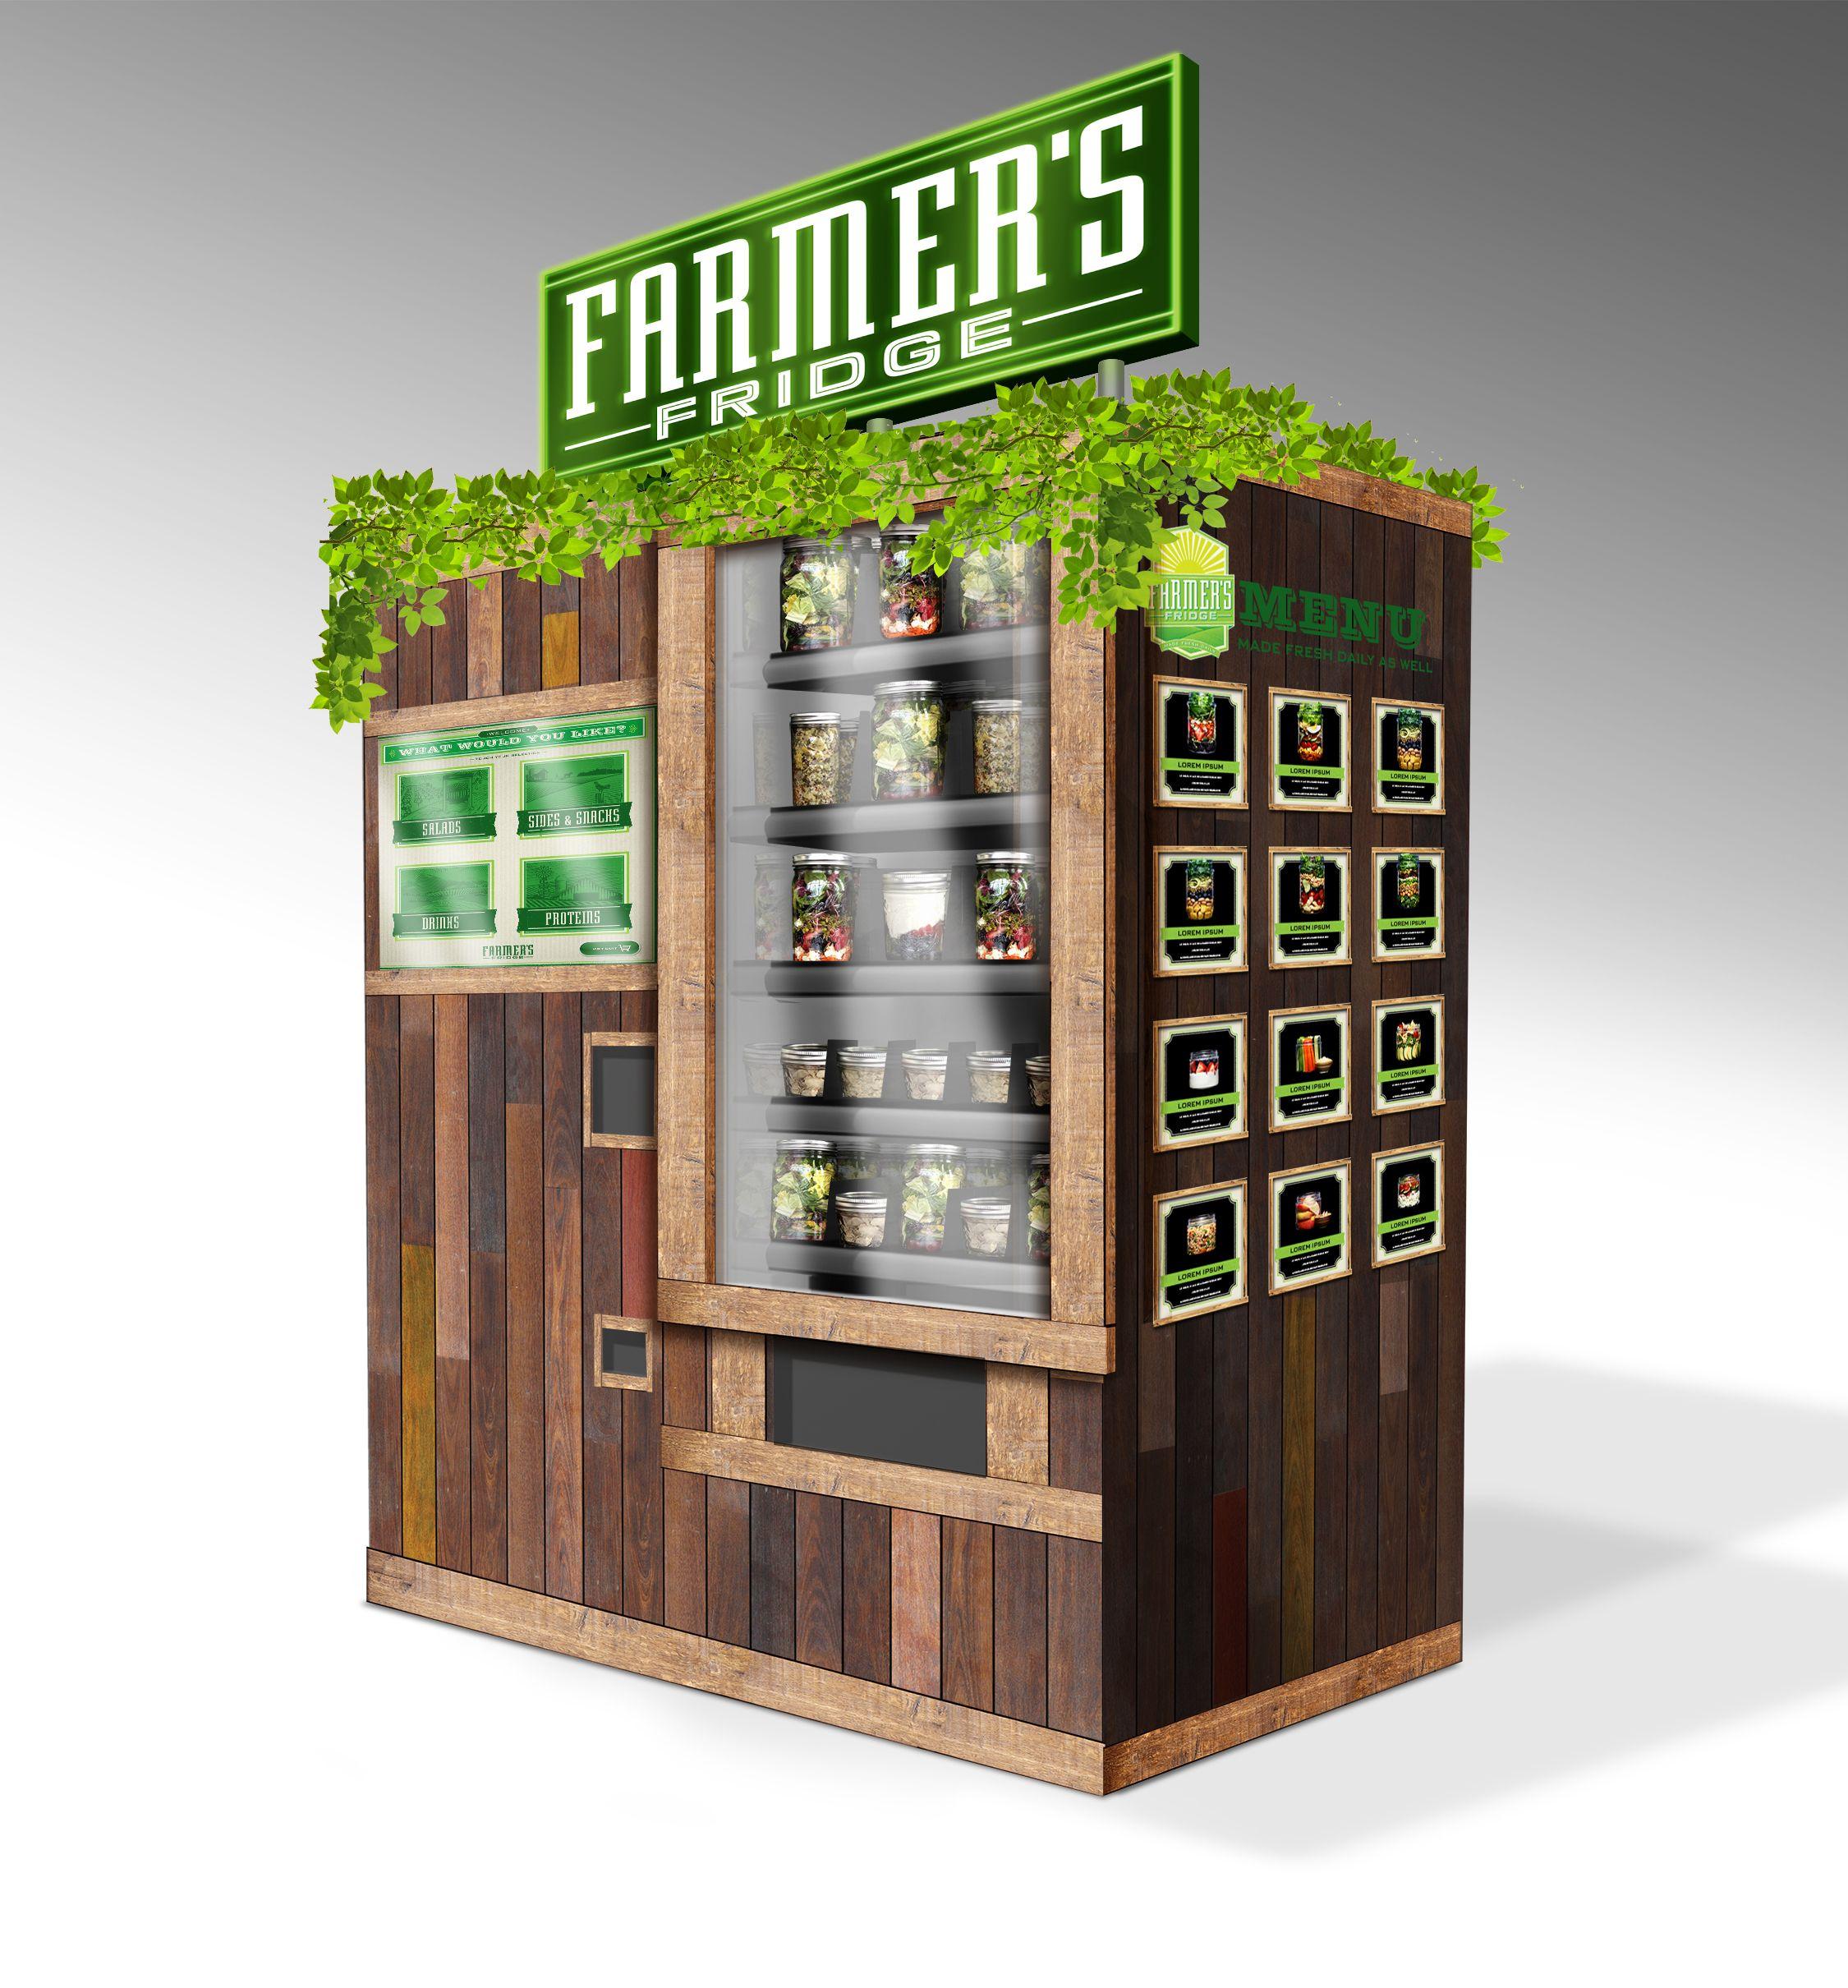 aramark fresh vending Google Search Healthy vending